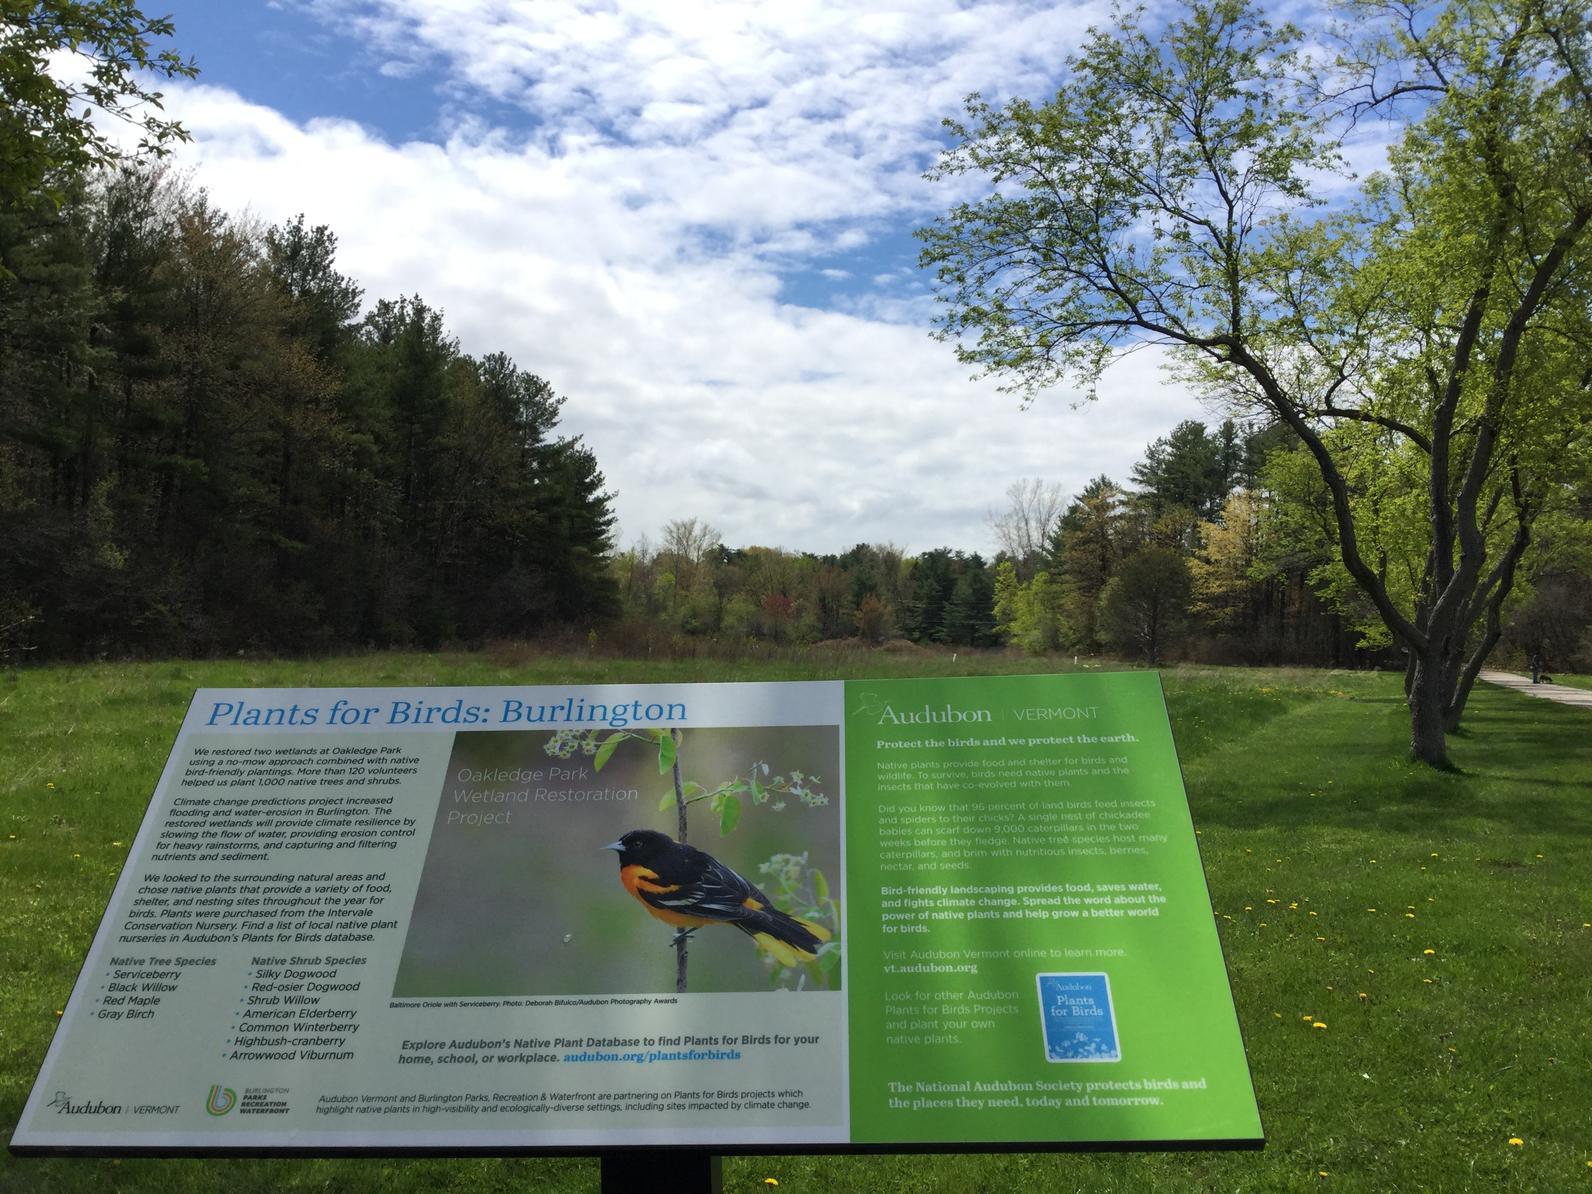 Plants for Birds Oakledge Park wetland restoration